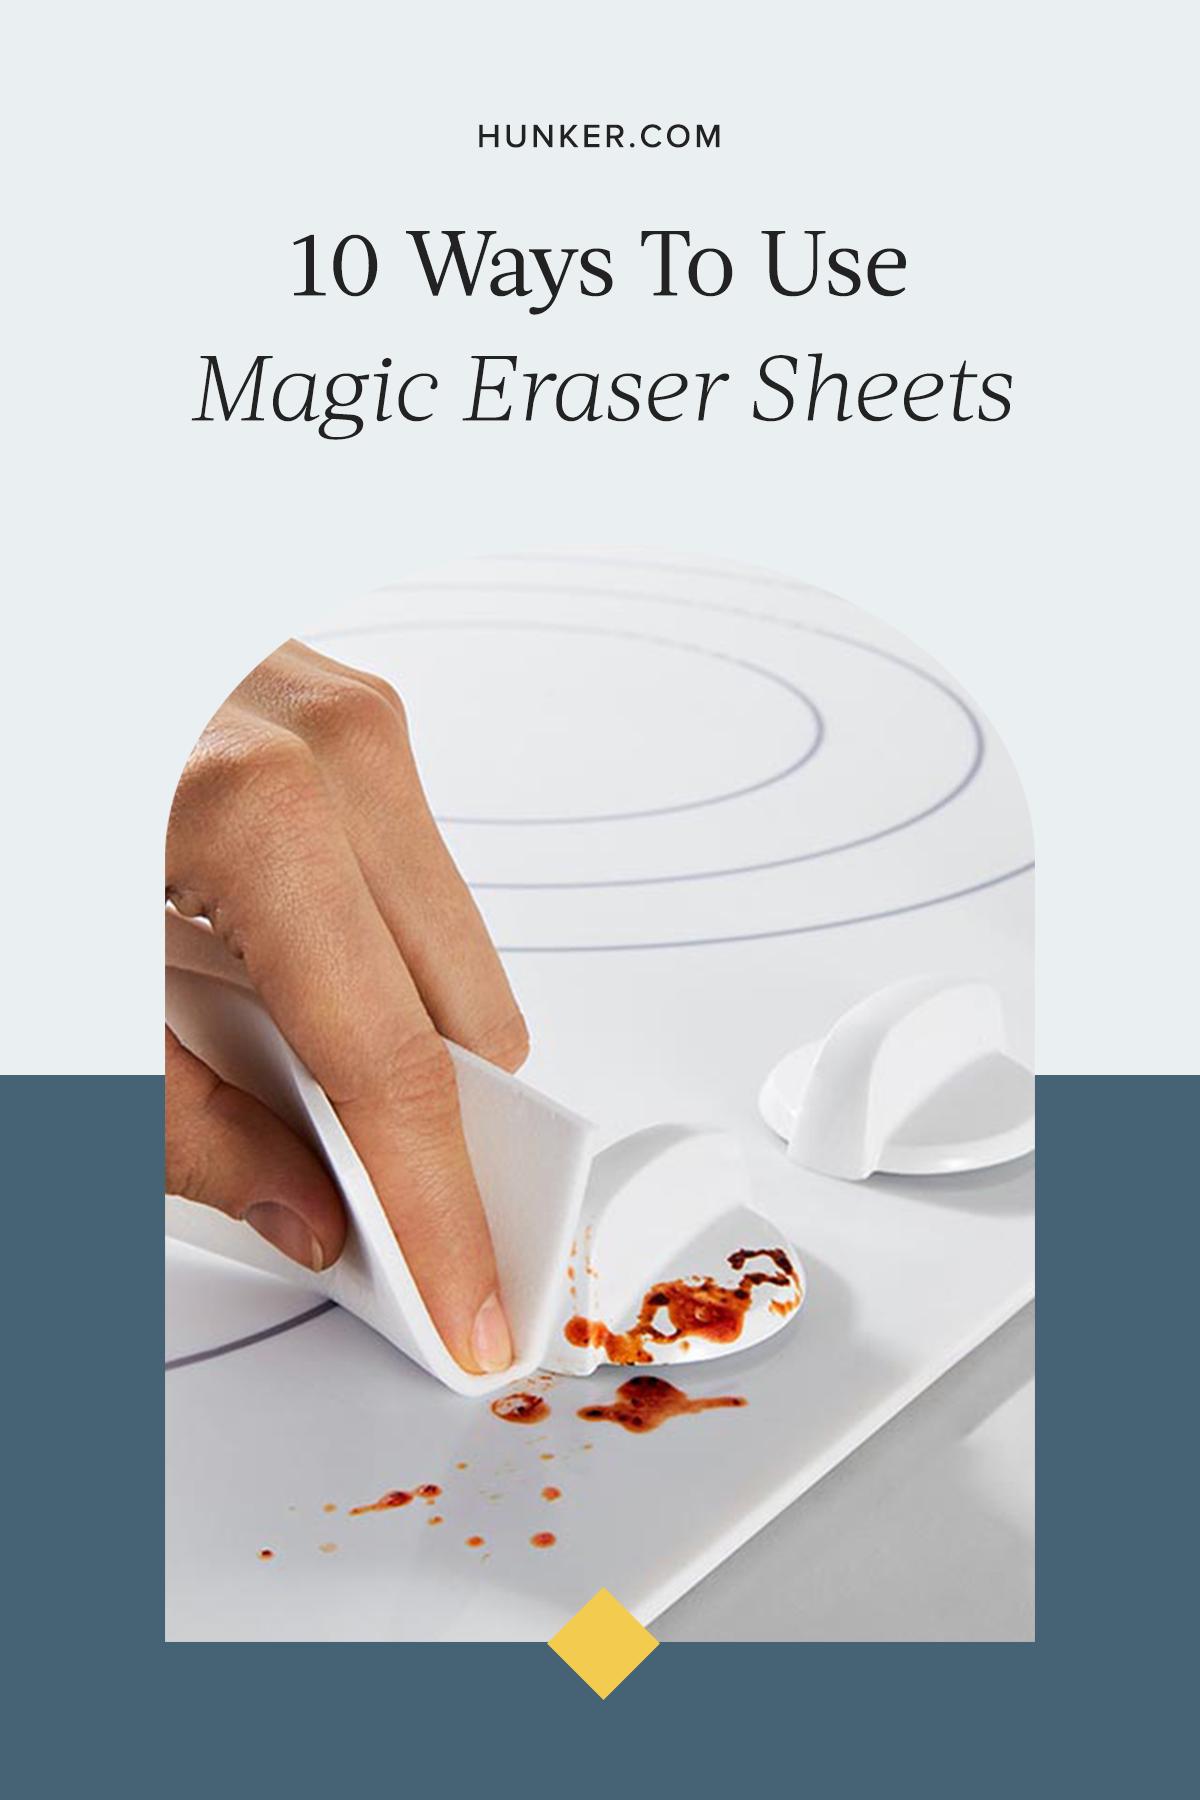 10 Surprisingly Magical Ways To Use Magic Eraser Sheets Hunker Magic Eraser Eraser Cleaning Hacks